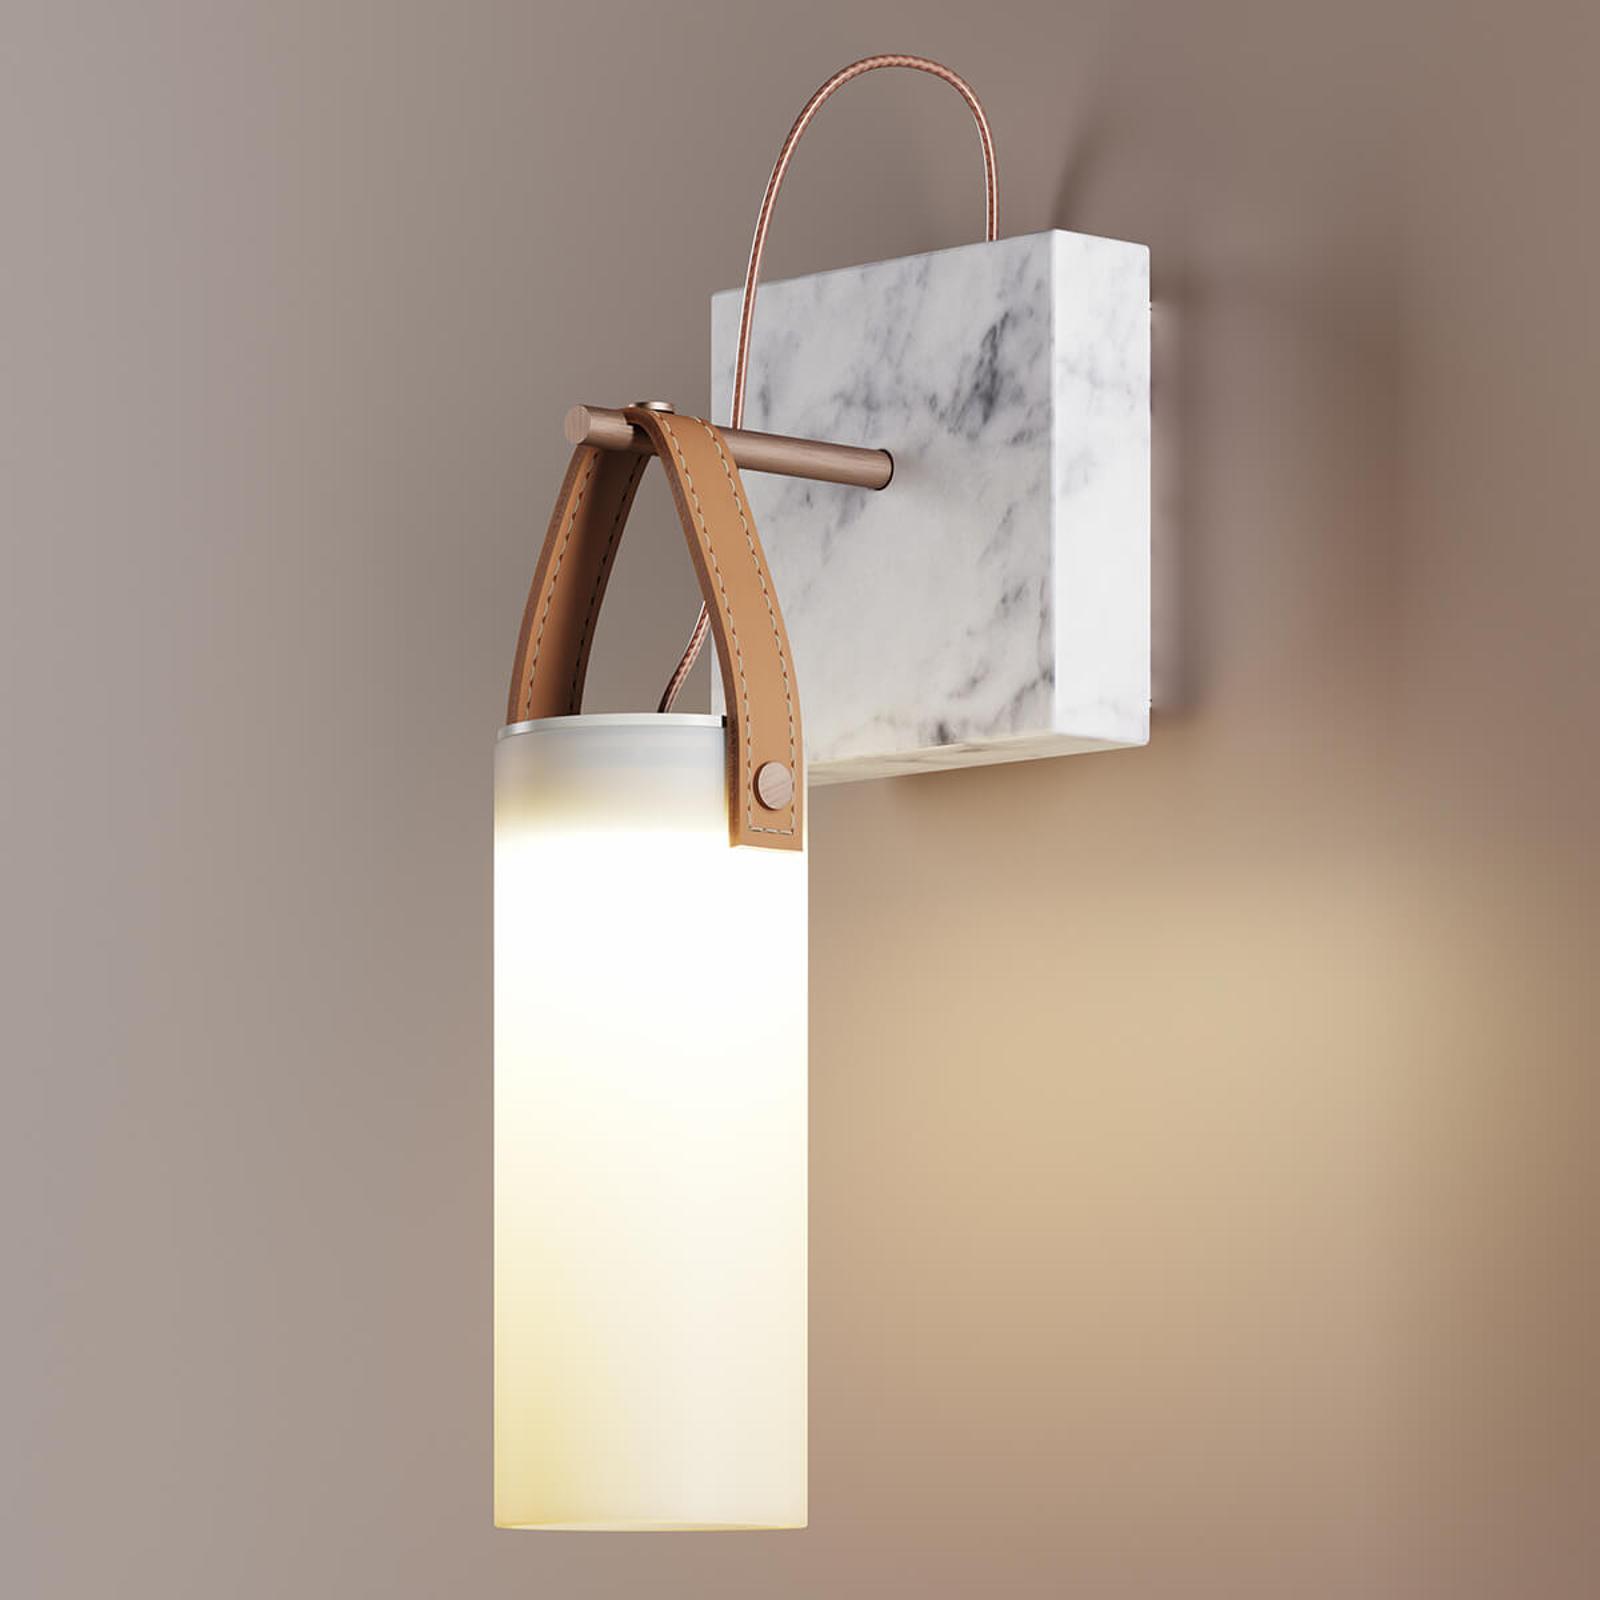 Designerska lampa ścienna LED Galerie